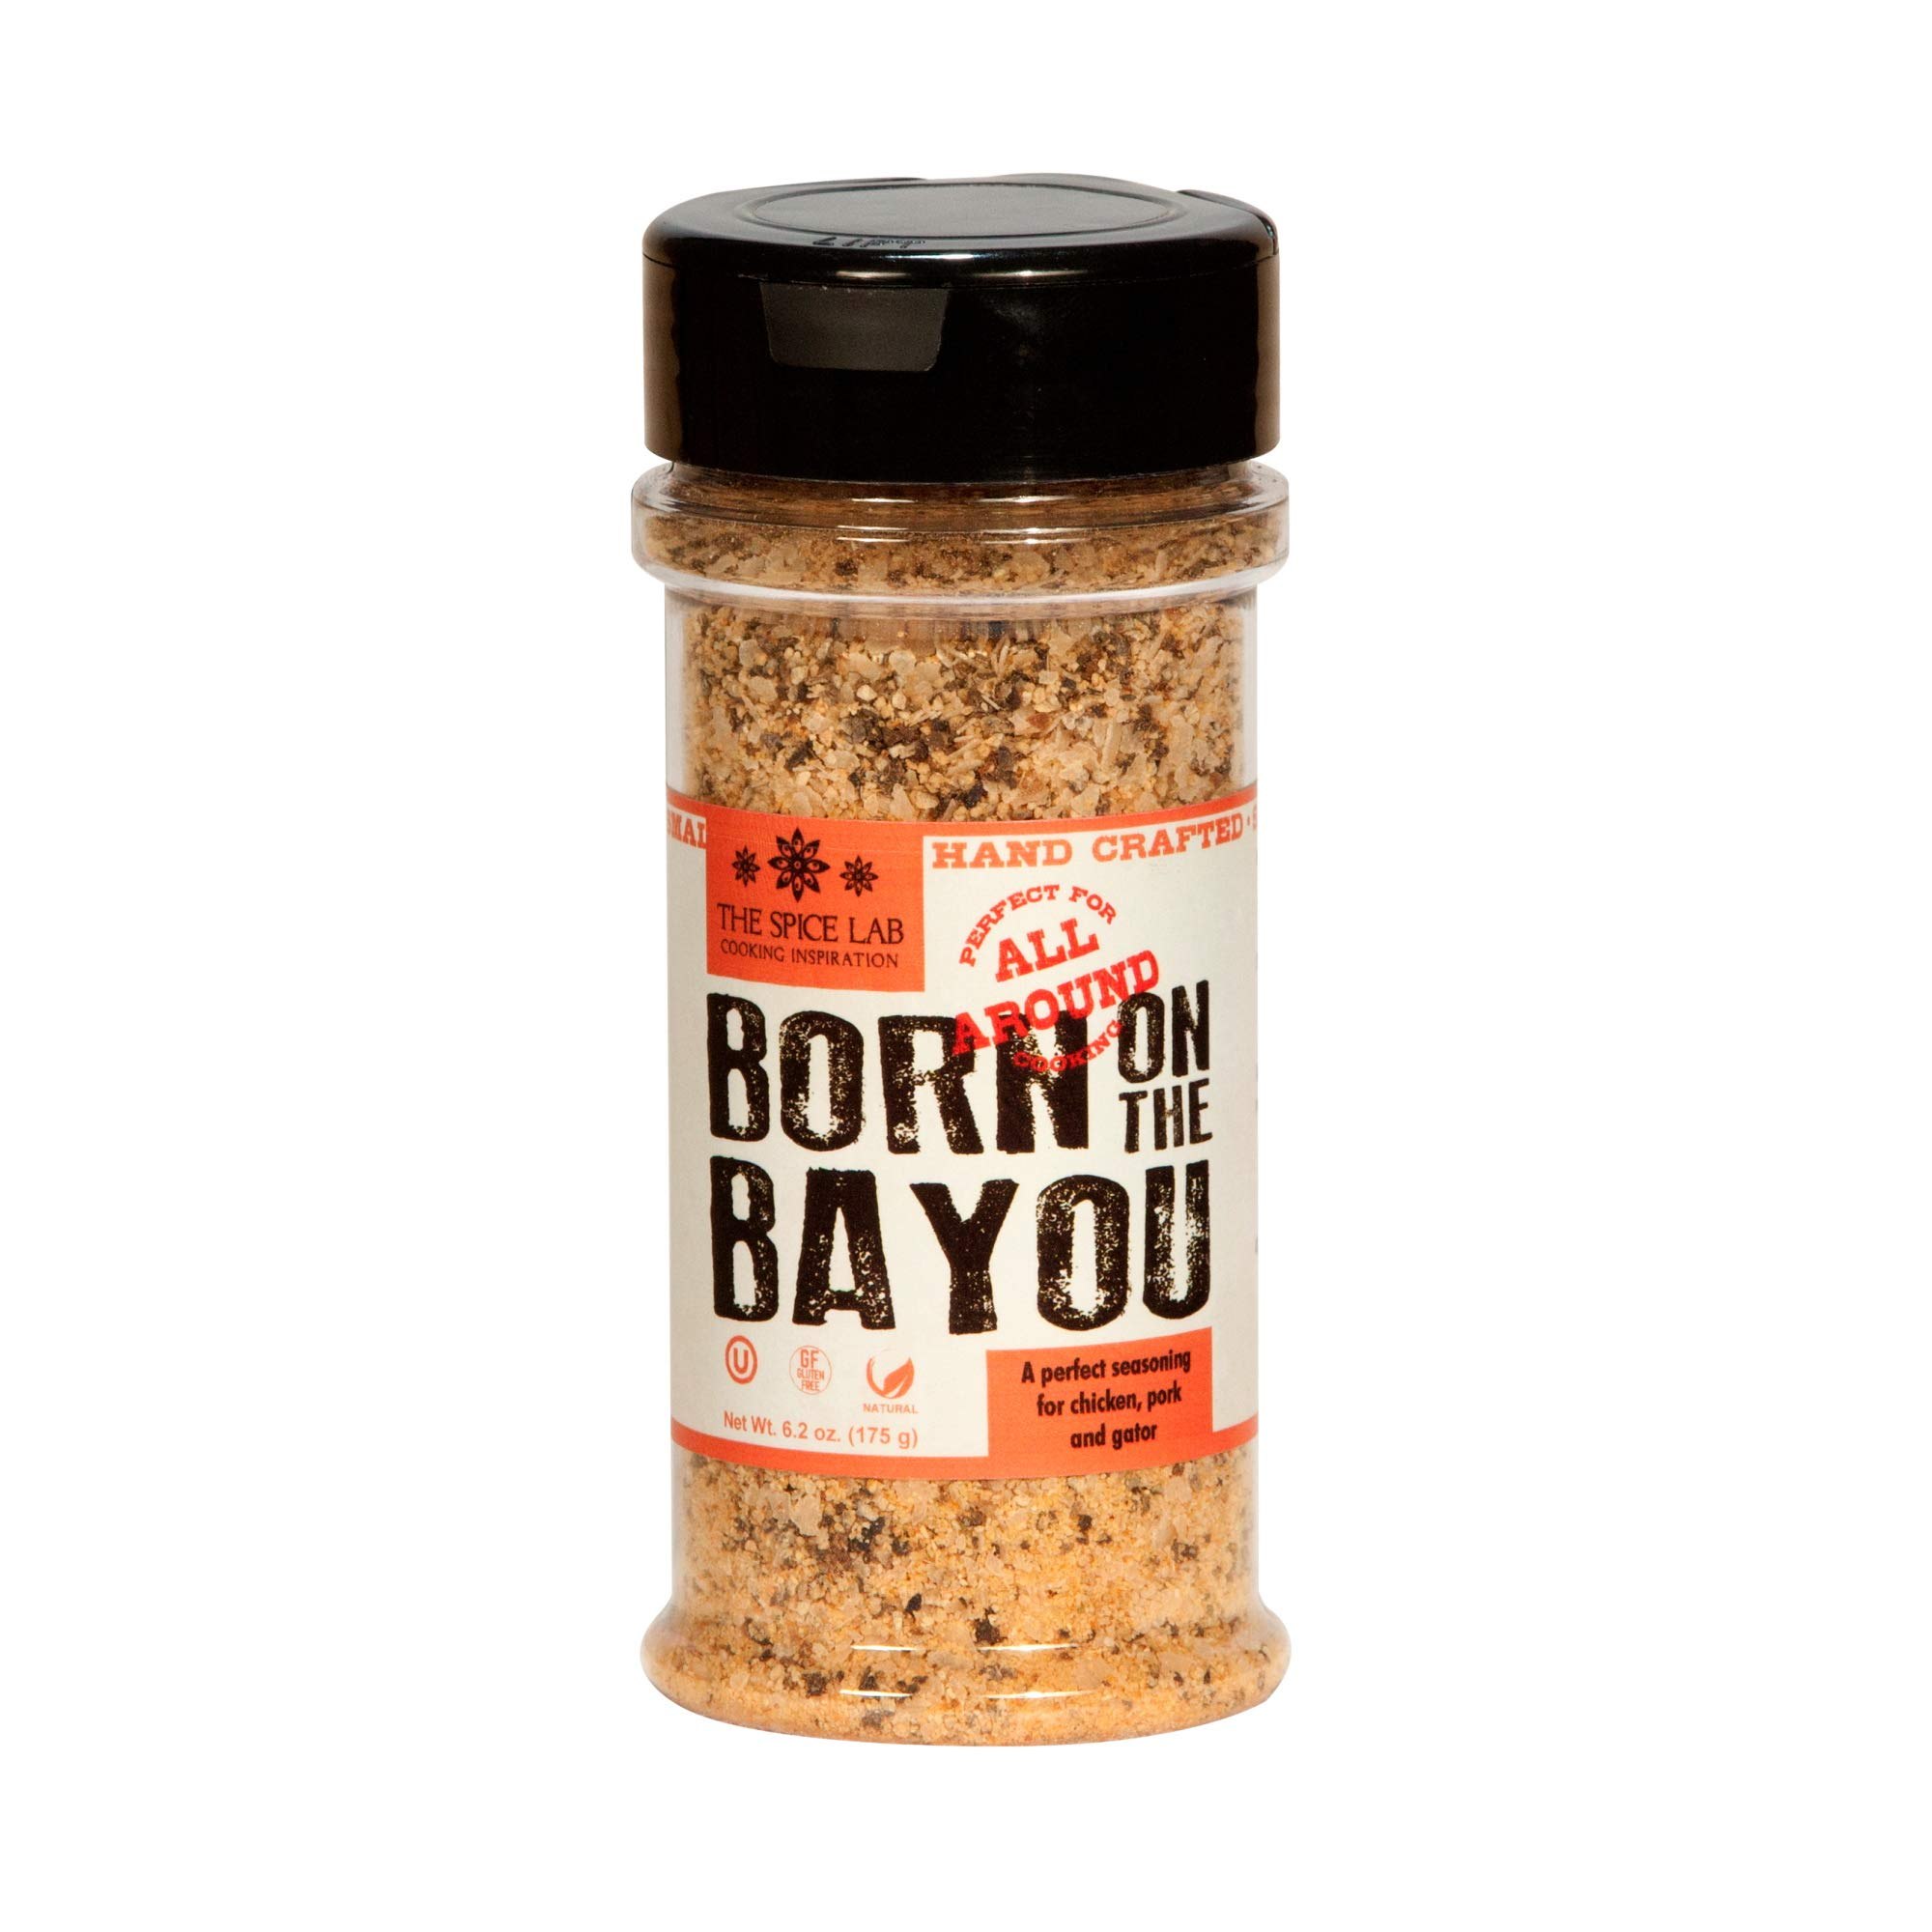 The Spice Lab No. 7002 - Born on the Bayou Chicken & Gator Rub - 6.2oz. Shaker Jar